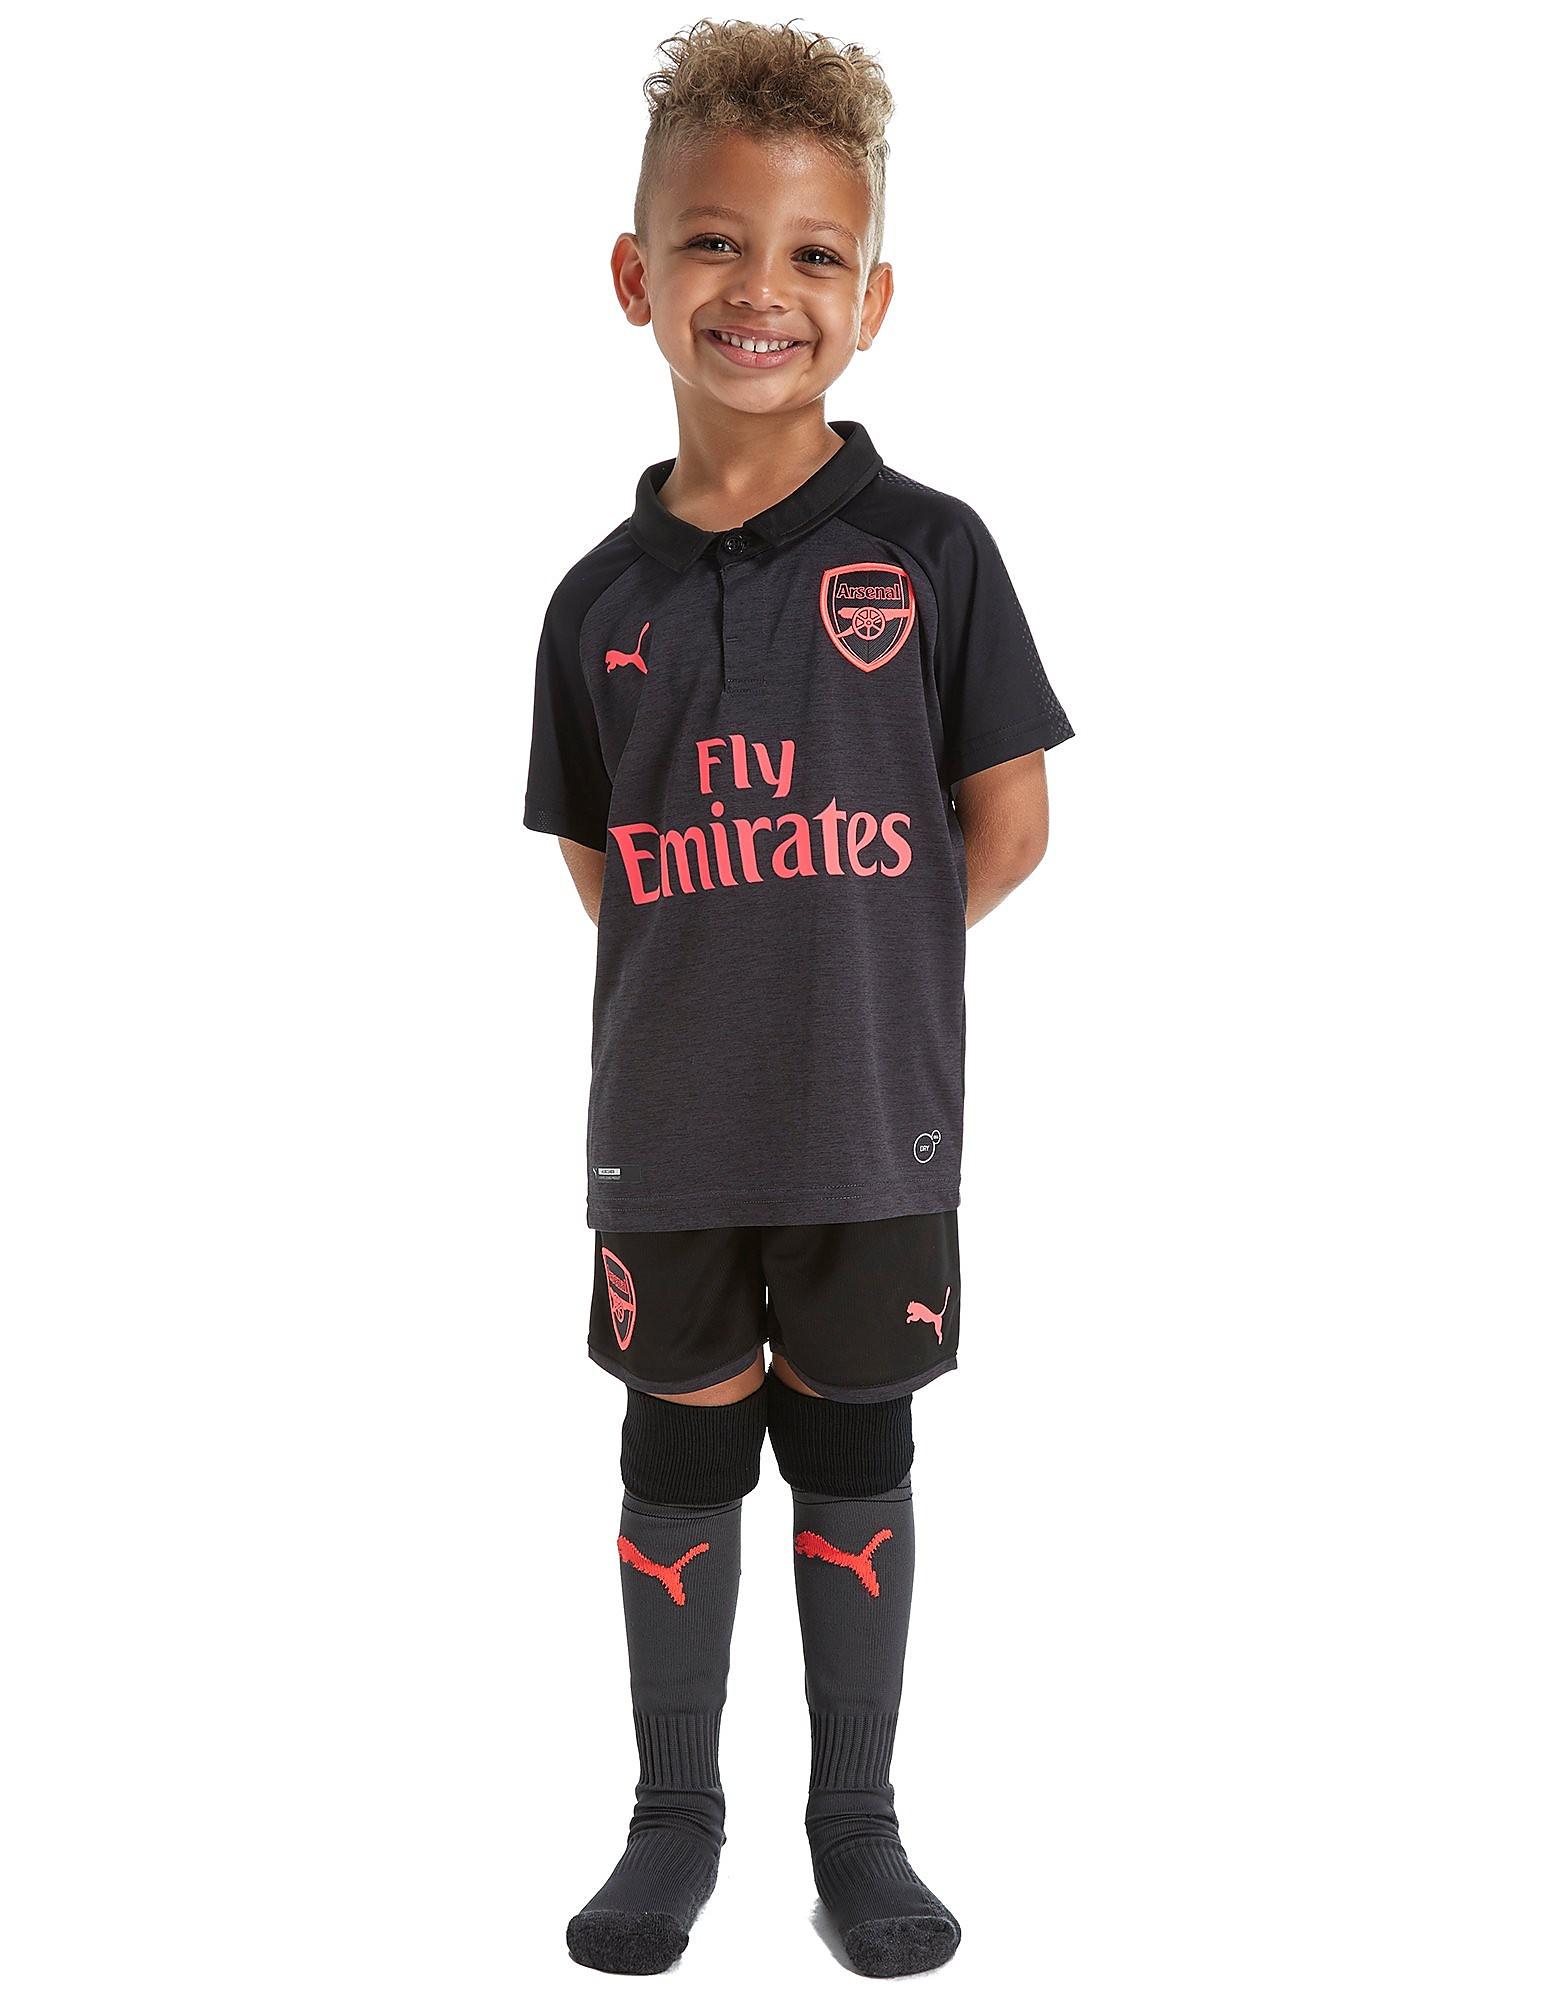 PUMA Mini Ensemble Enfant Arsenal FC 2017/18